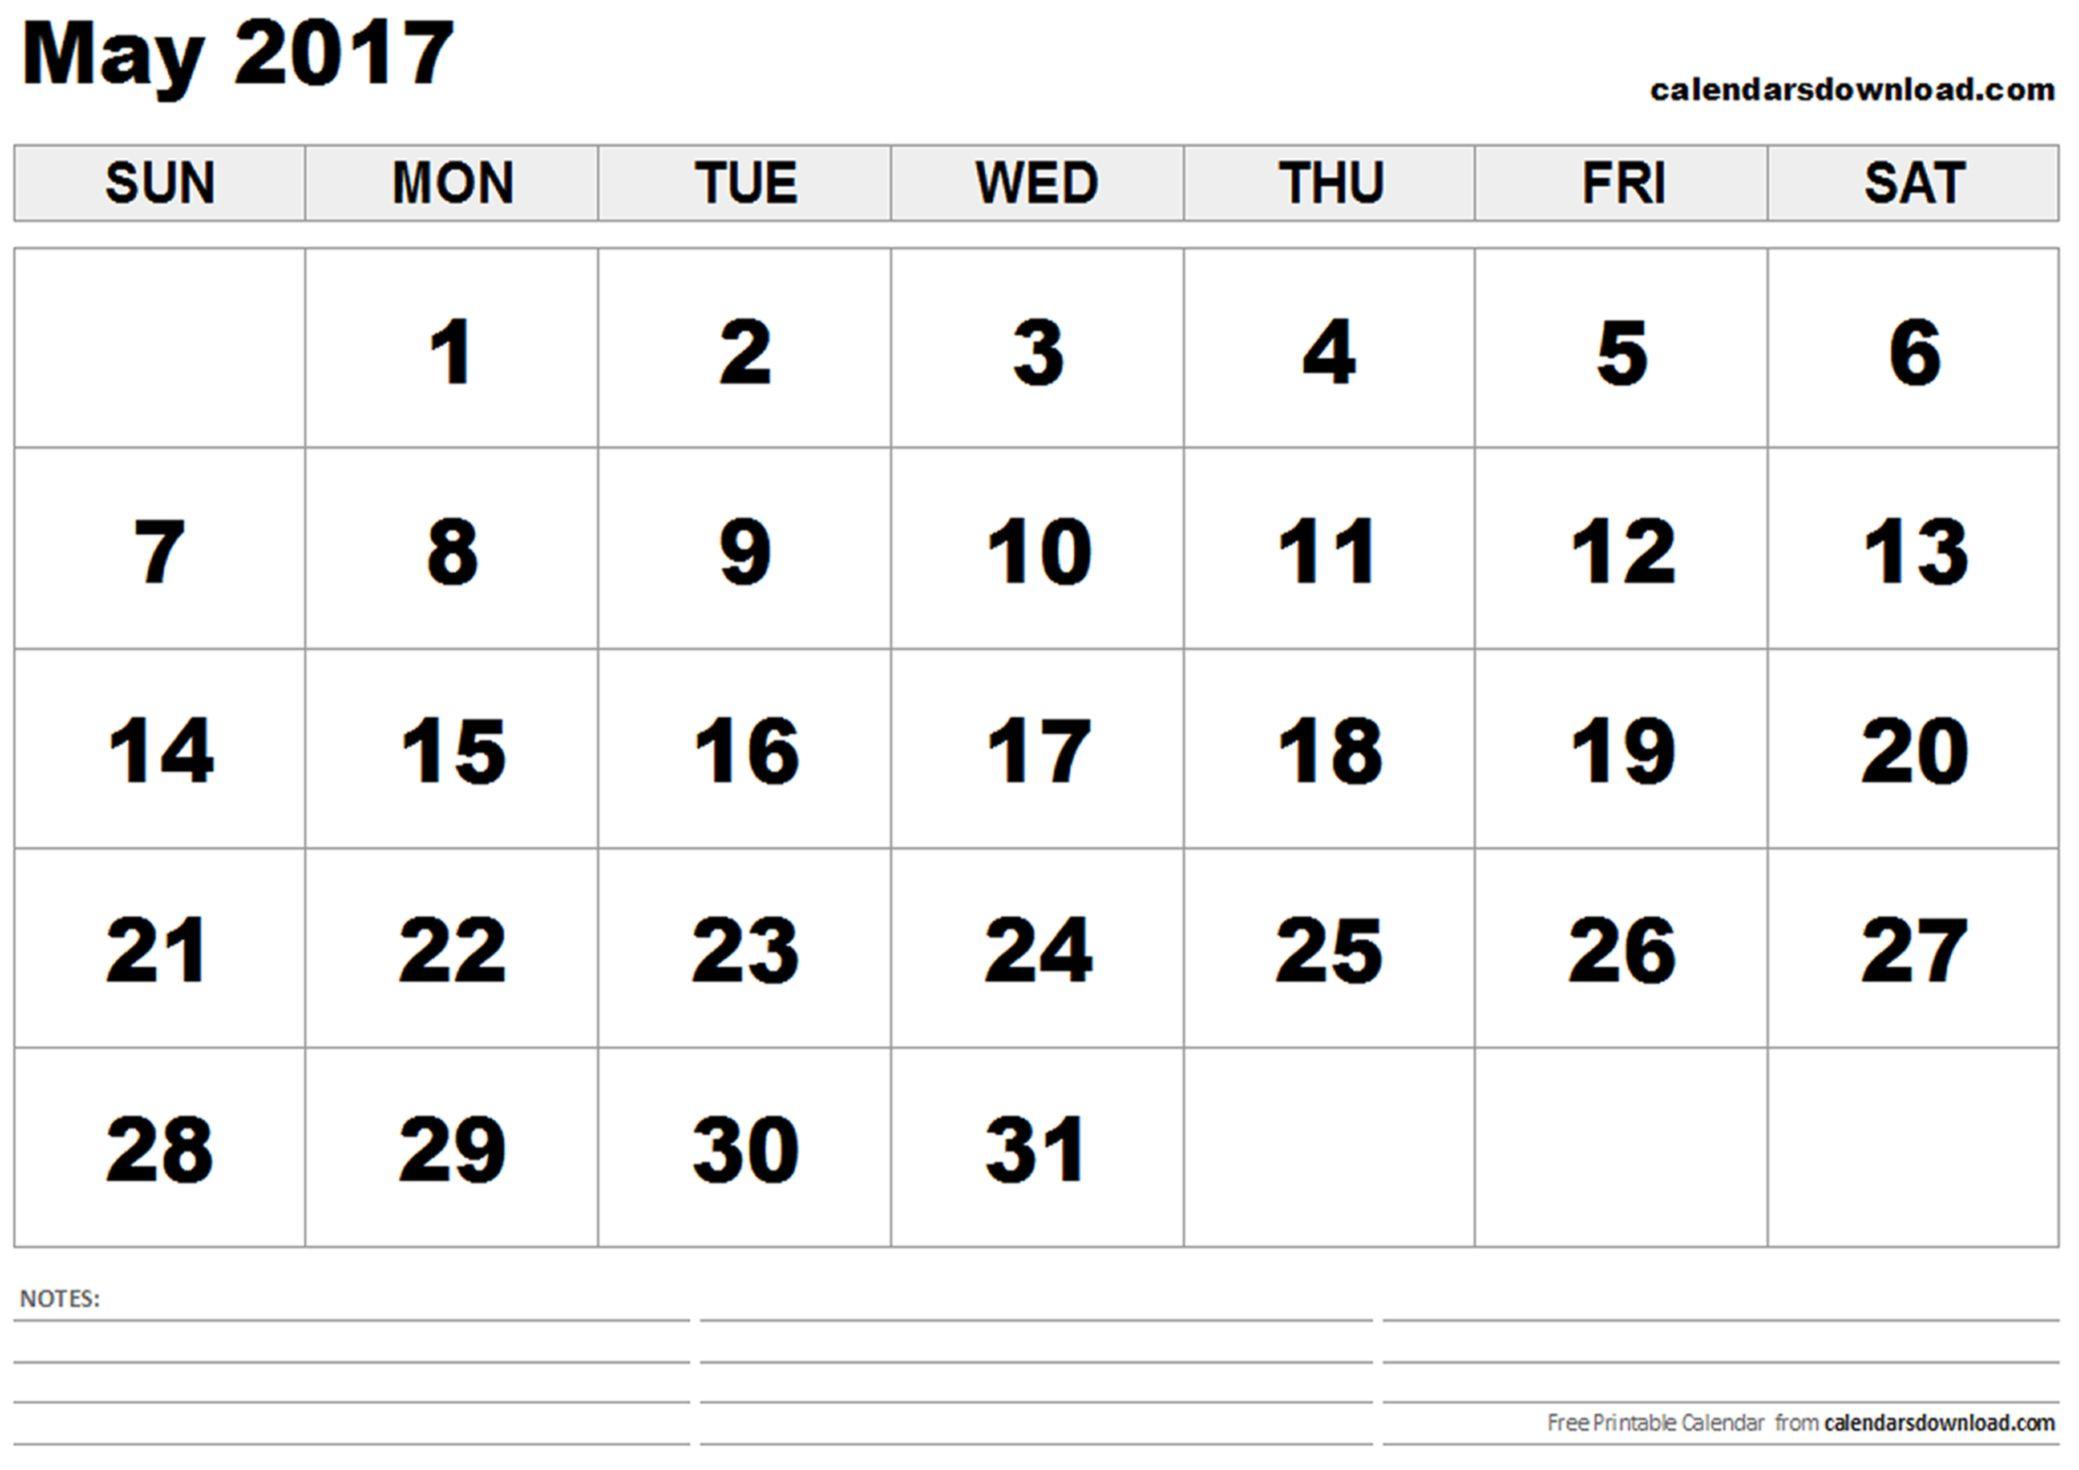 Großzügig Druckbare Leere Kalender Fotos - FORTSETZUNG ARBEITSBLATT ...